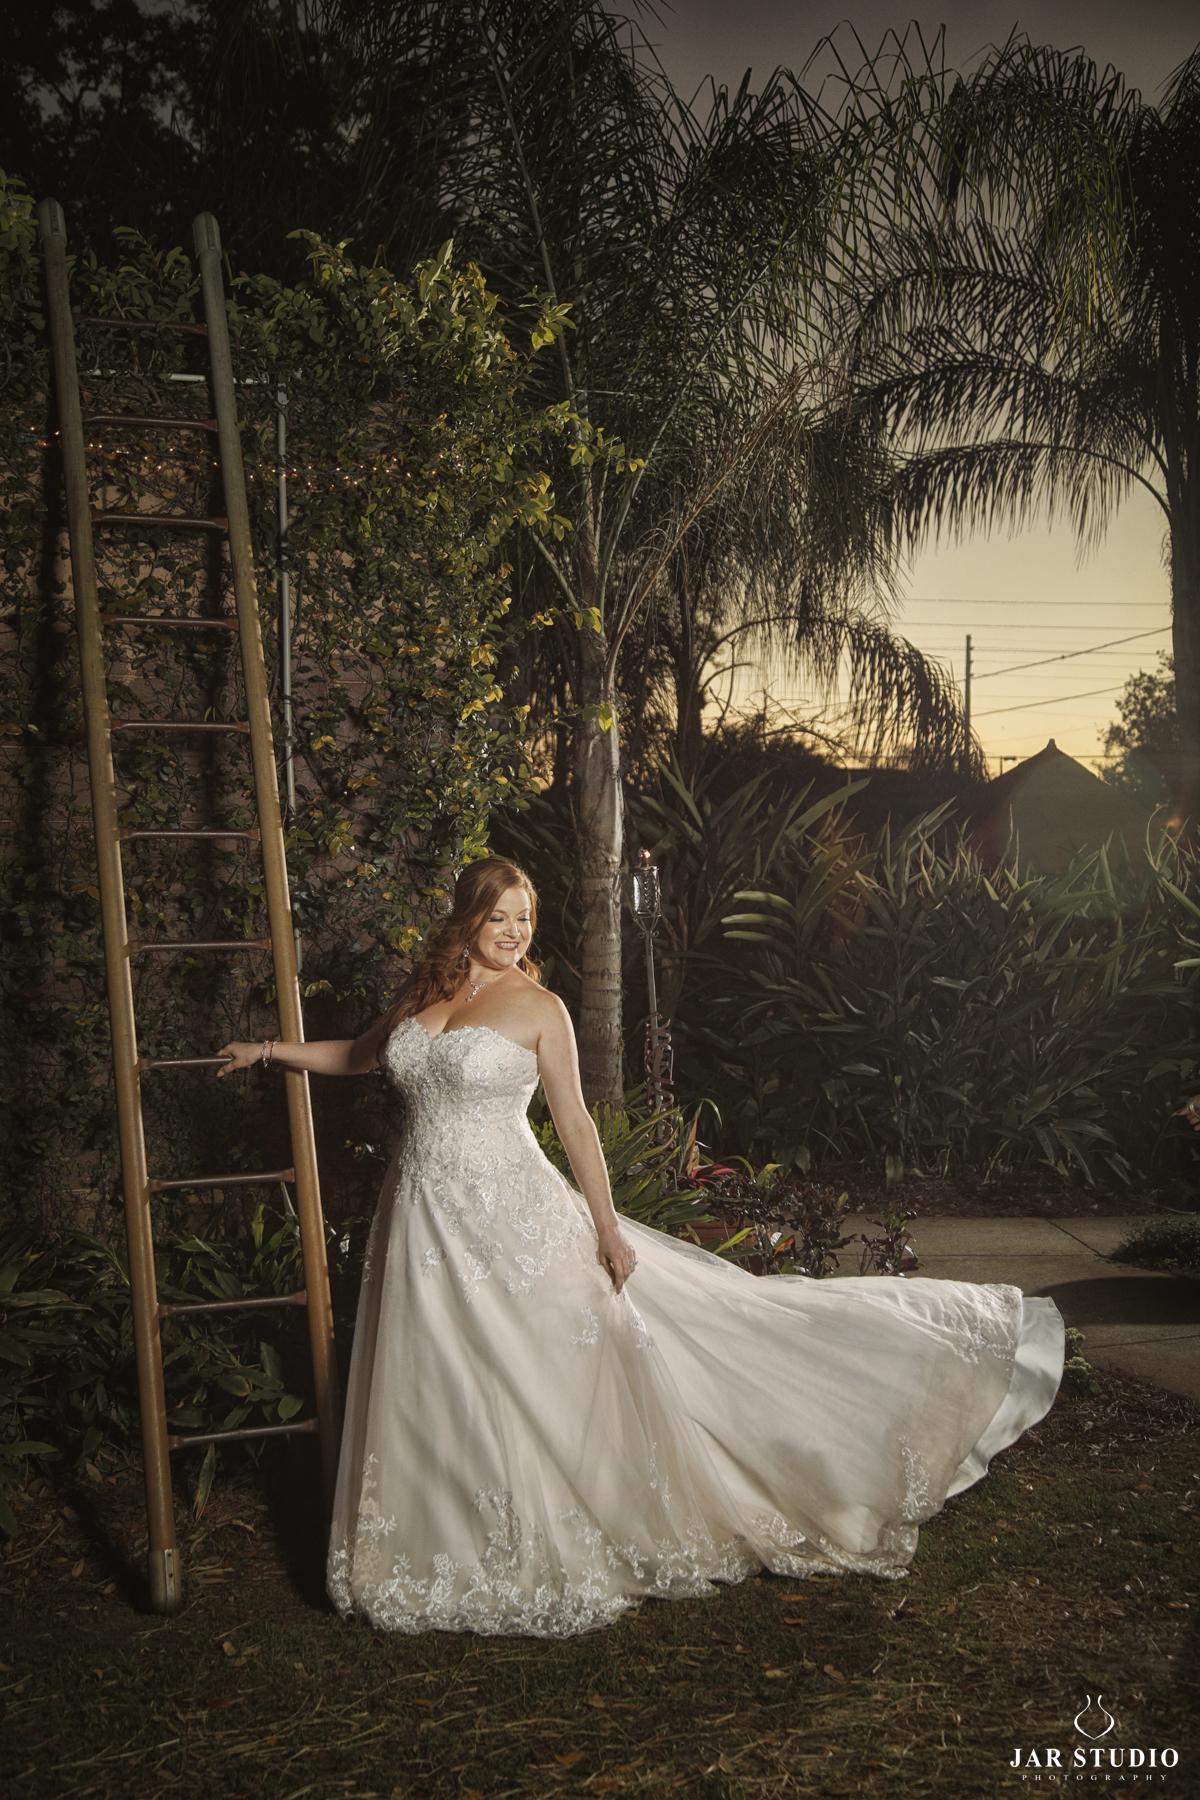 29-beautiful-place-bride-portraits-jarstudio.JPG